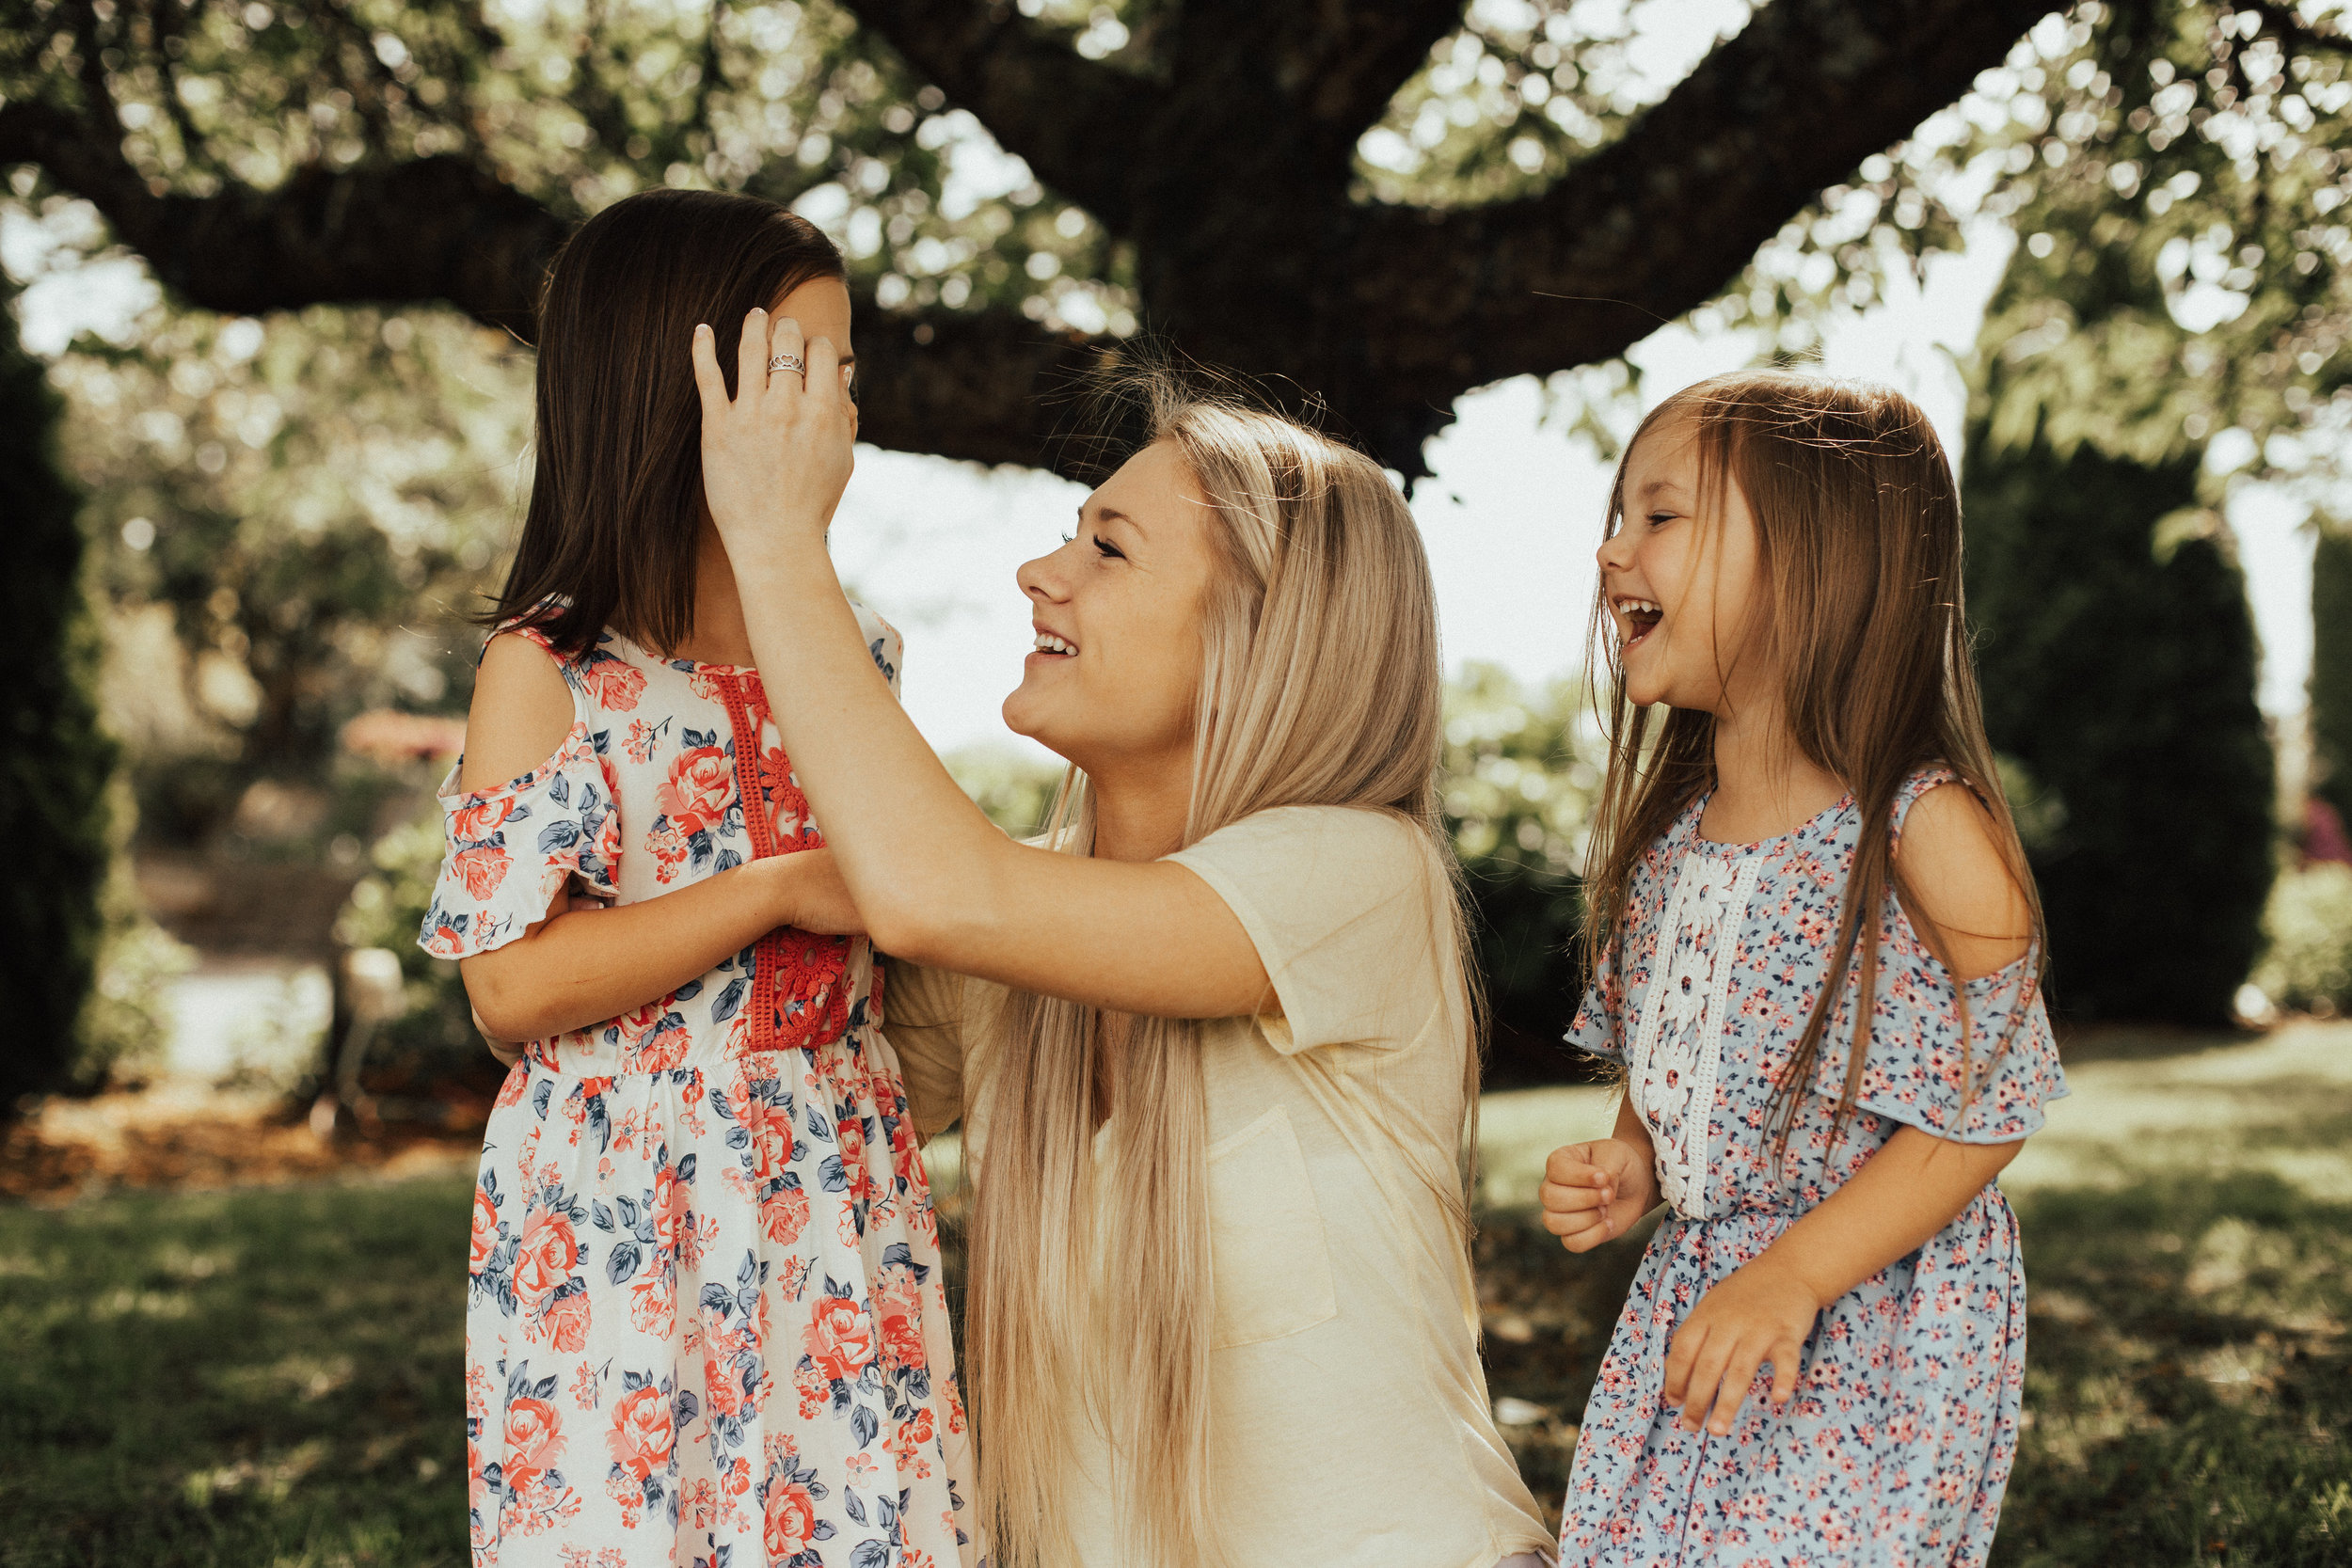 Lacey Shulke Family Photos-Lacy Shulke-0001.jpg